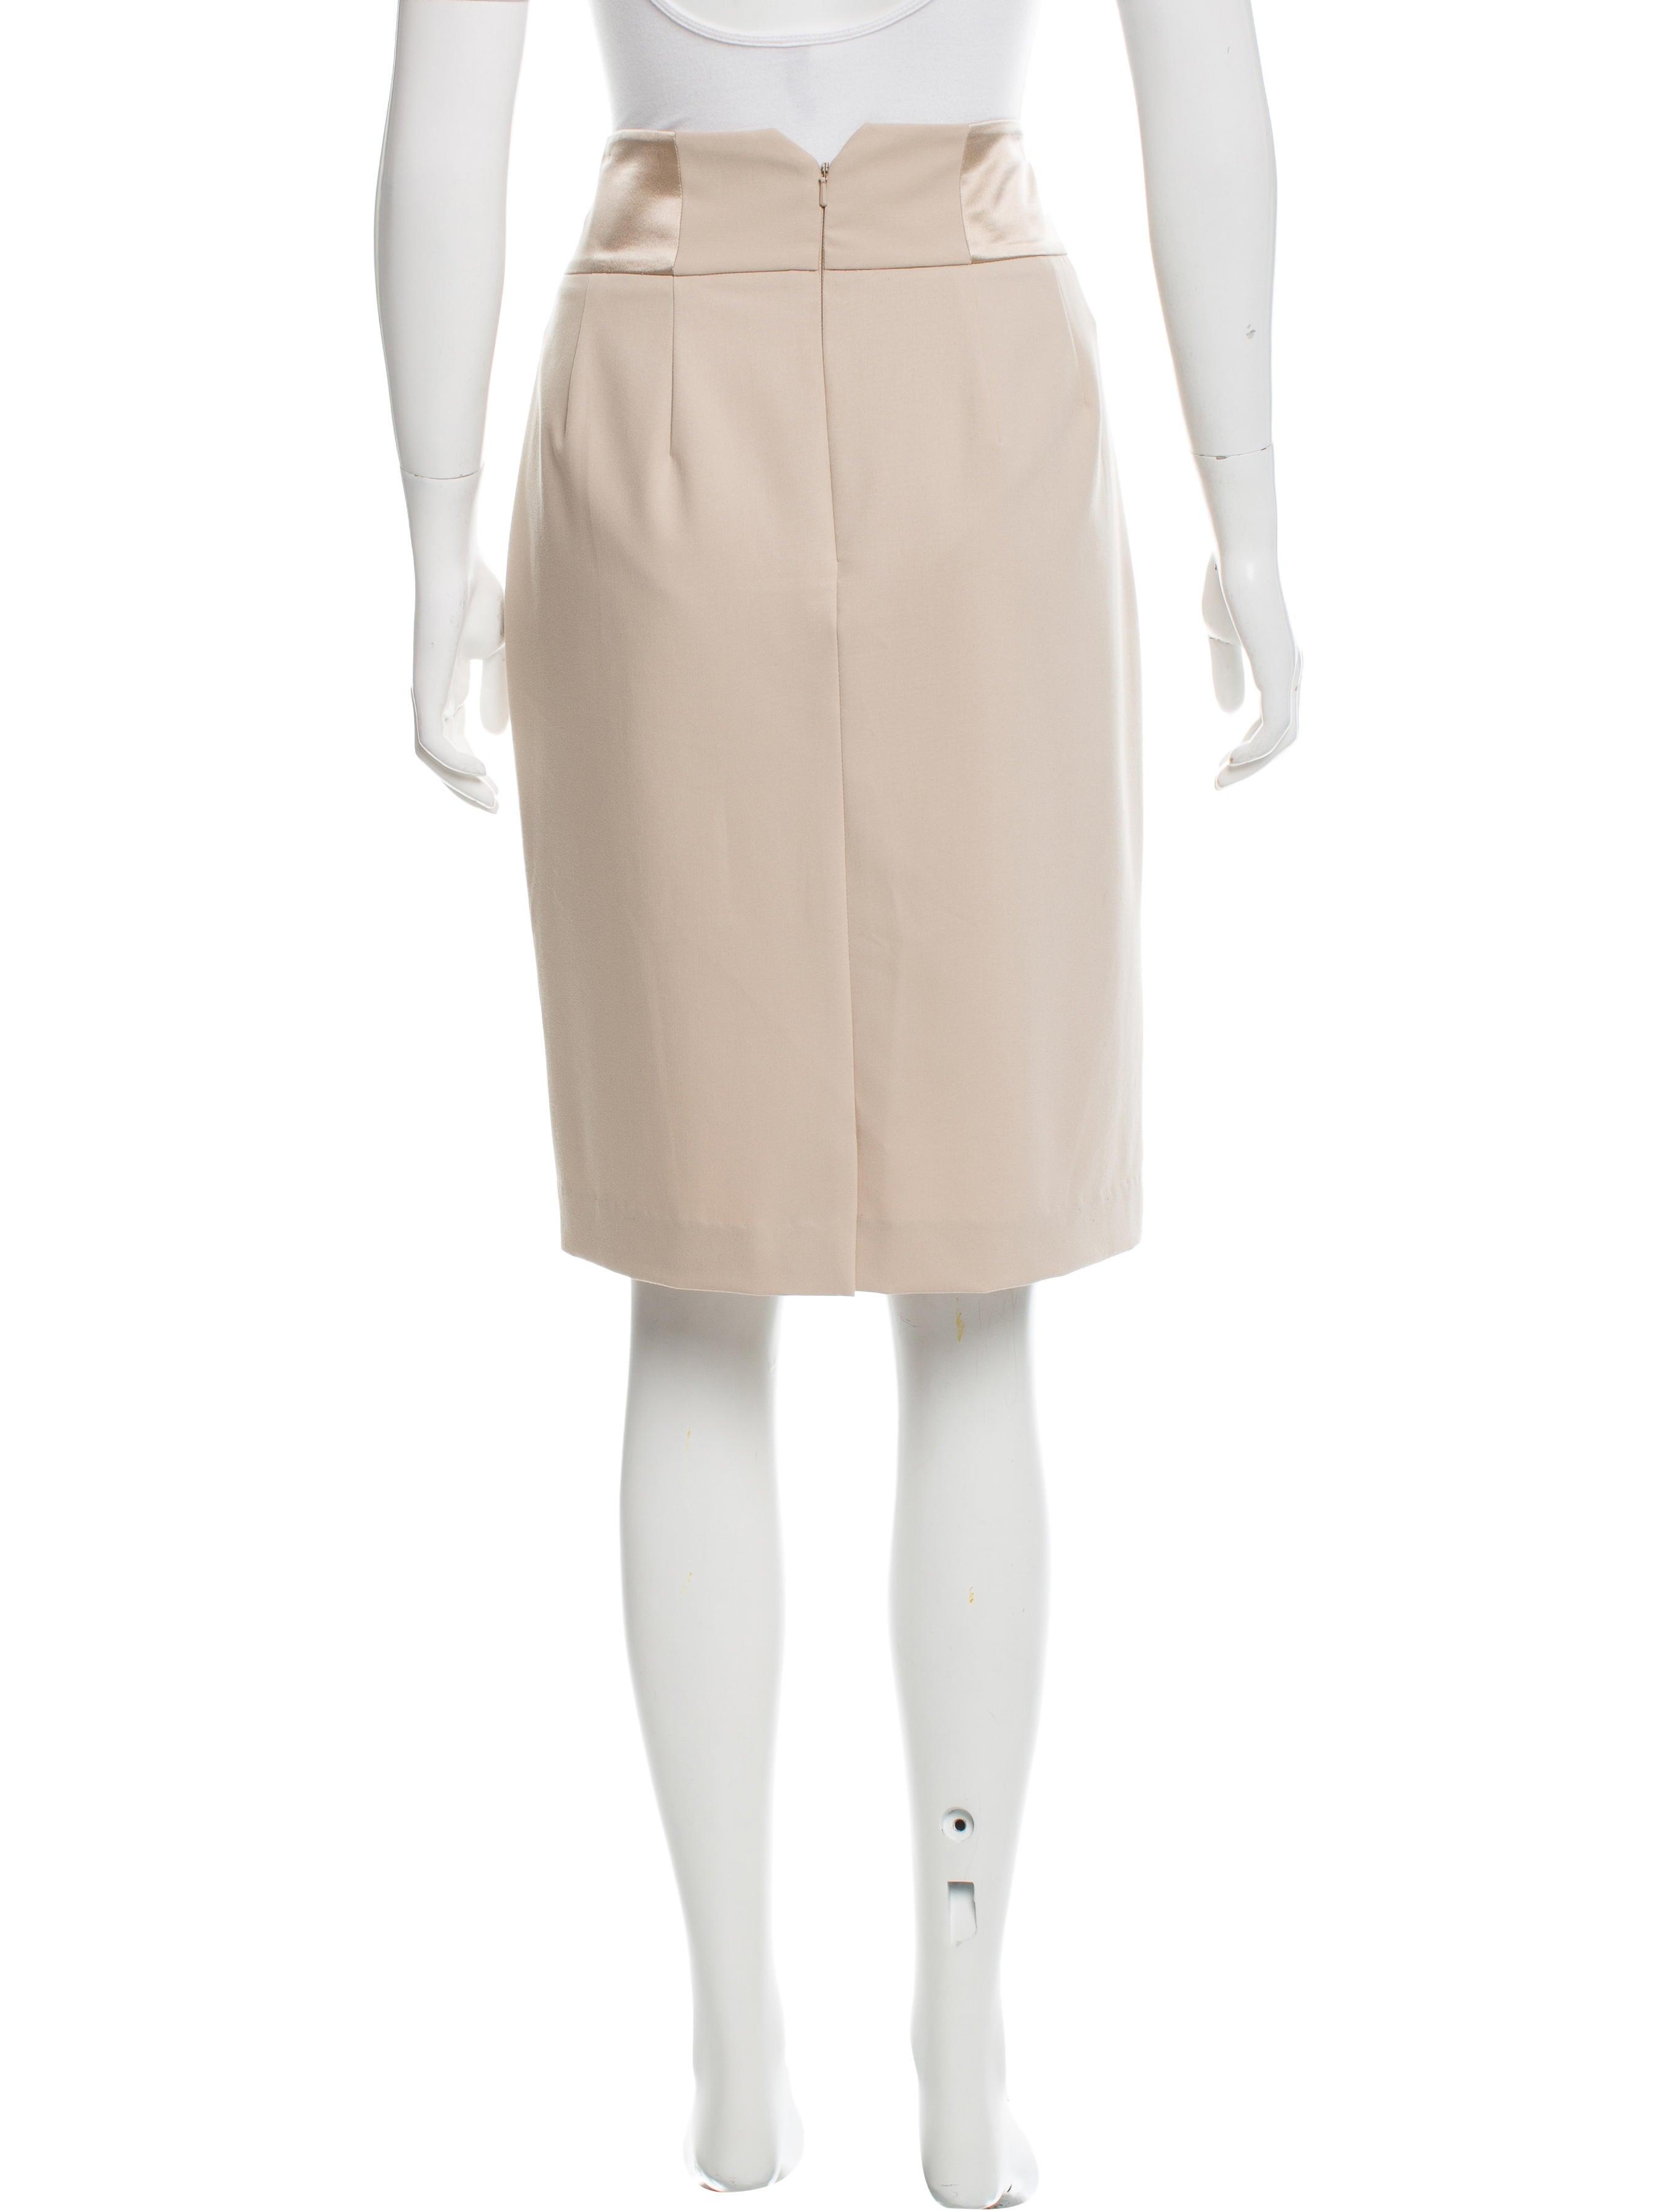 magaschoni knee length pencil skirt clothing wn124626